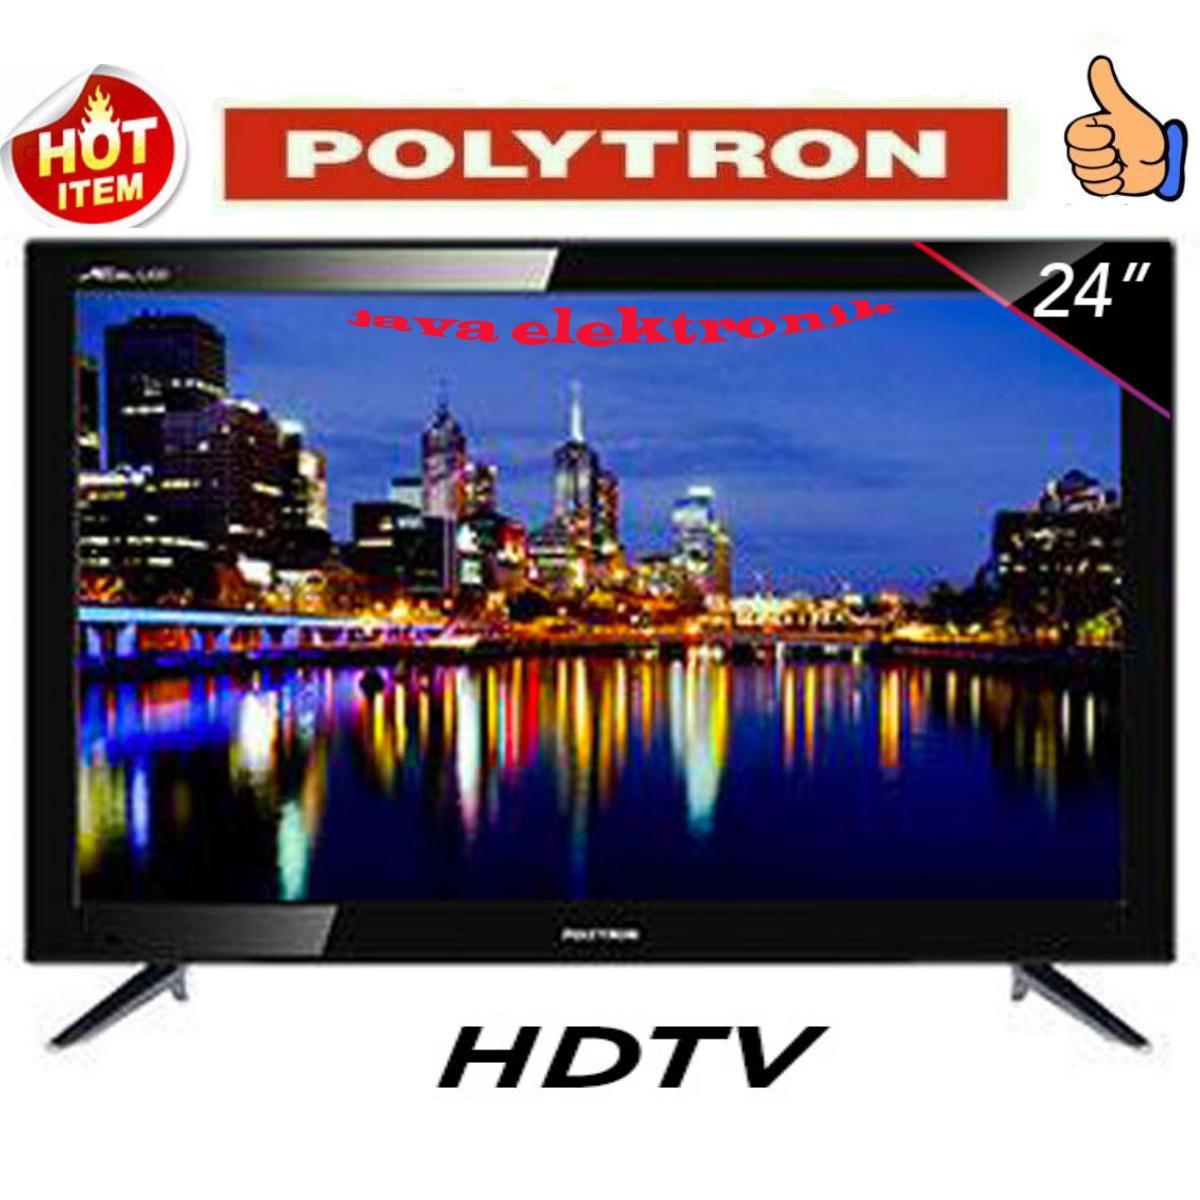 POLYTRON LED TV 24 Inch HD - PLD24D8511 garansi resmi